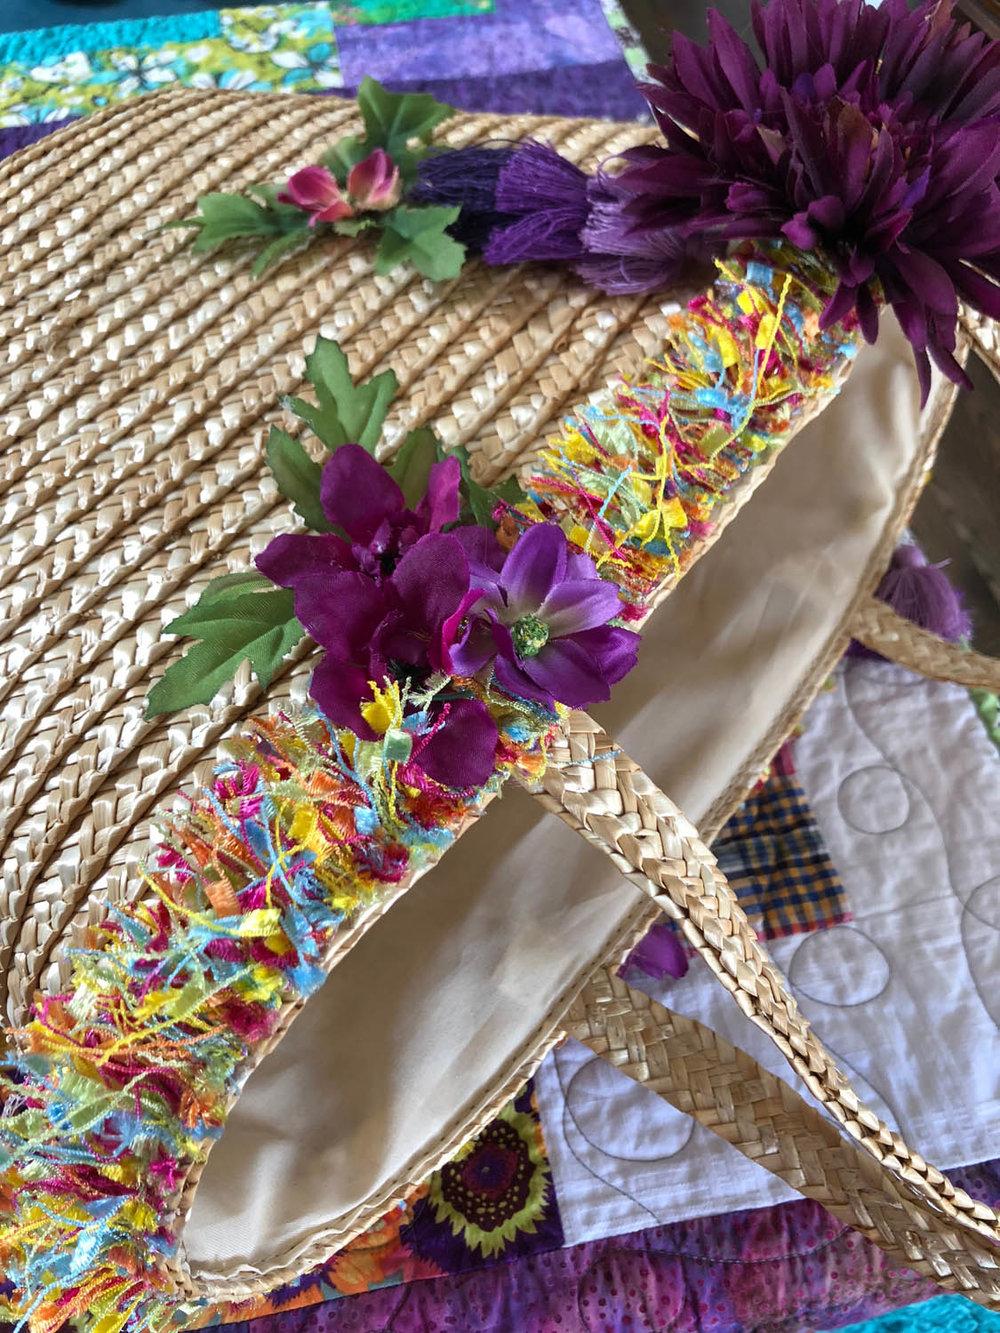 summer embellished straw tote bag on a quilt